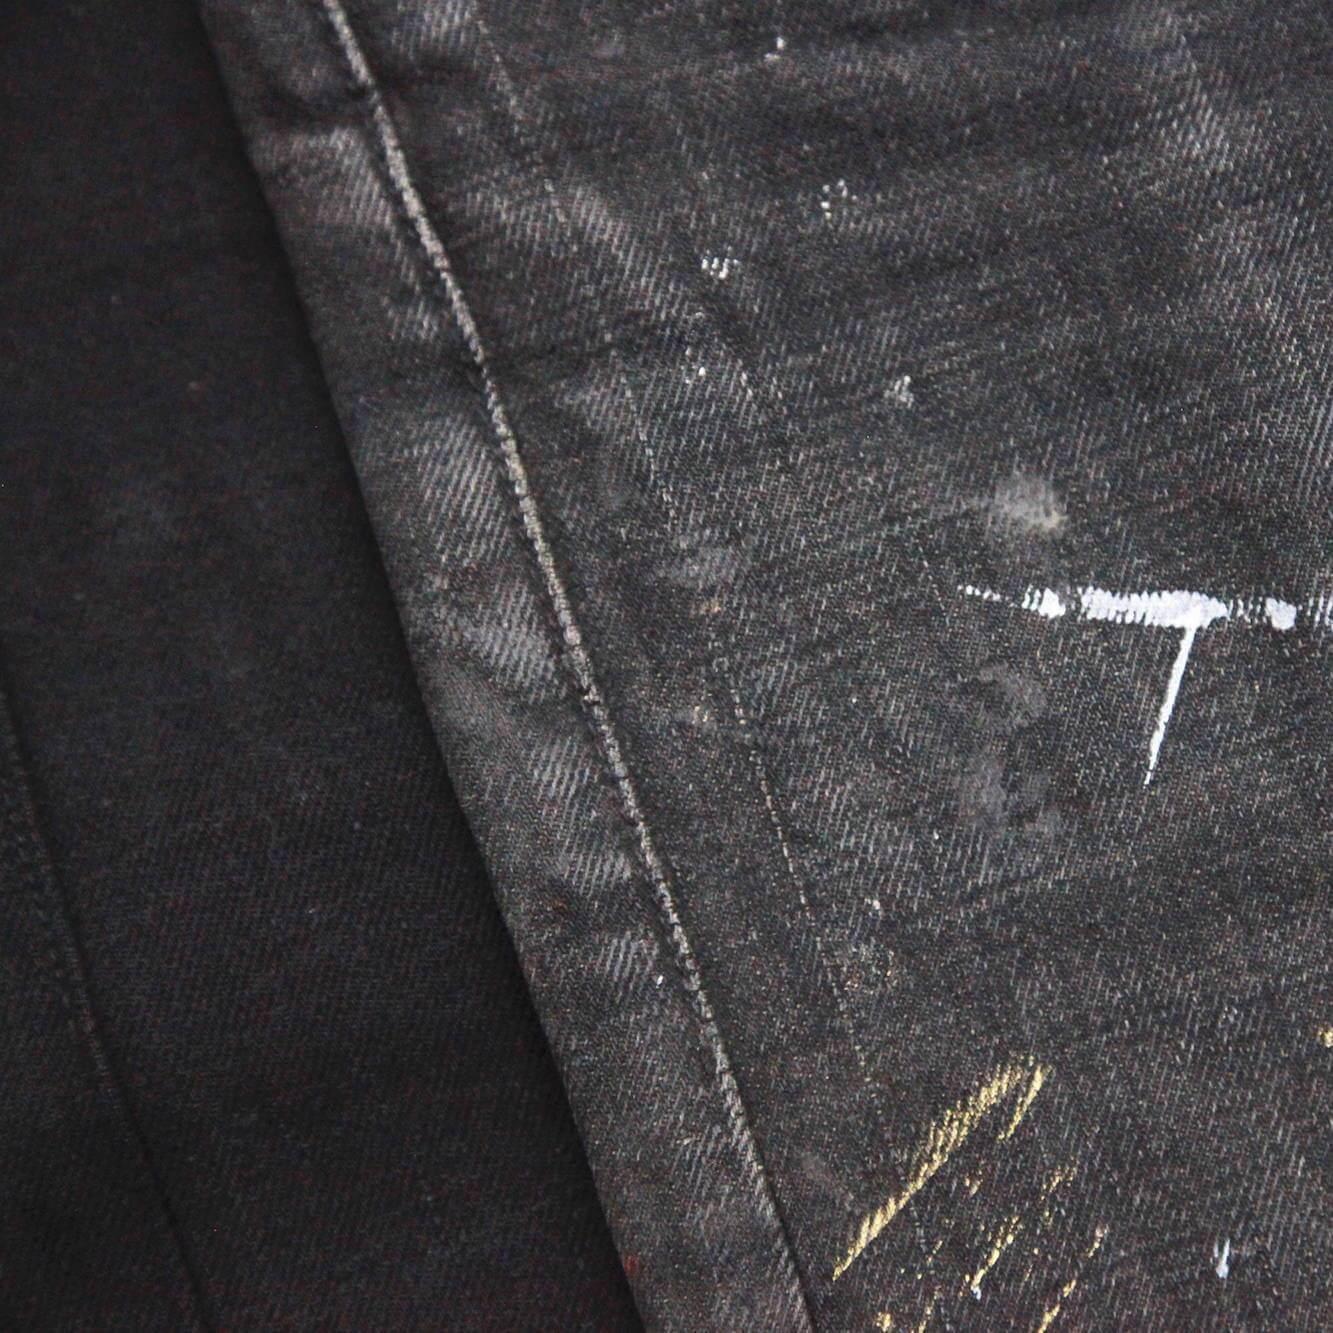 detail image of black denim